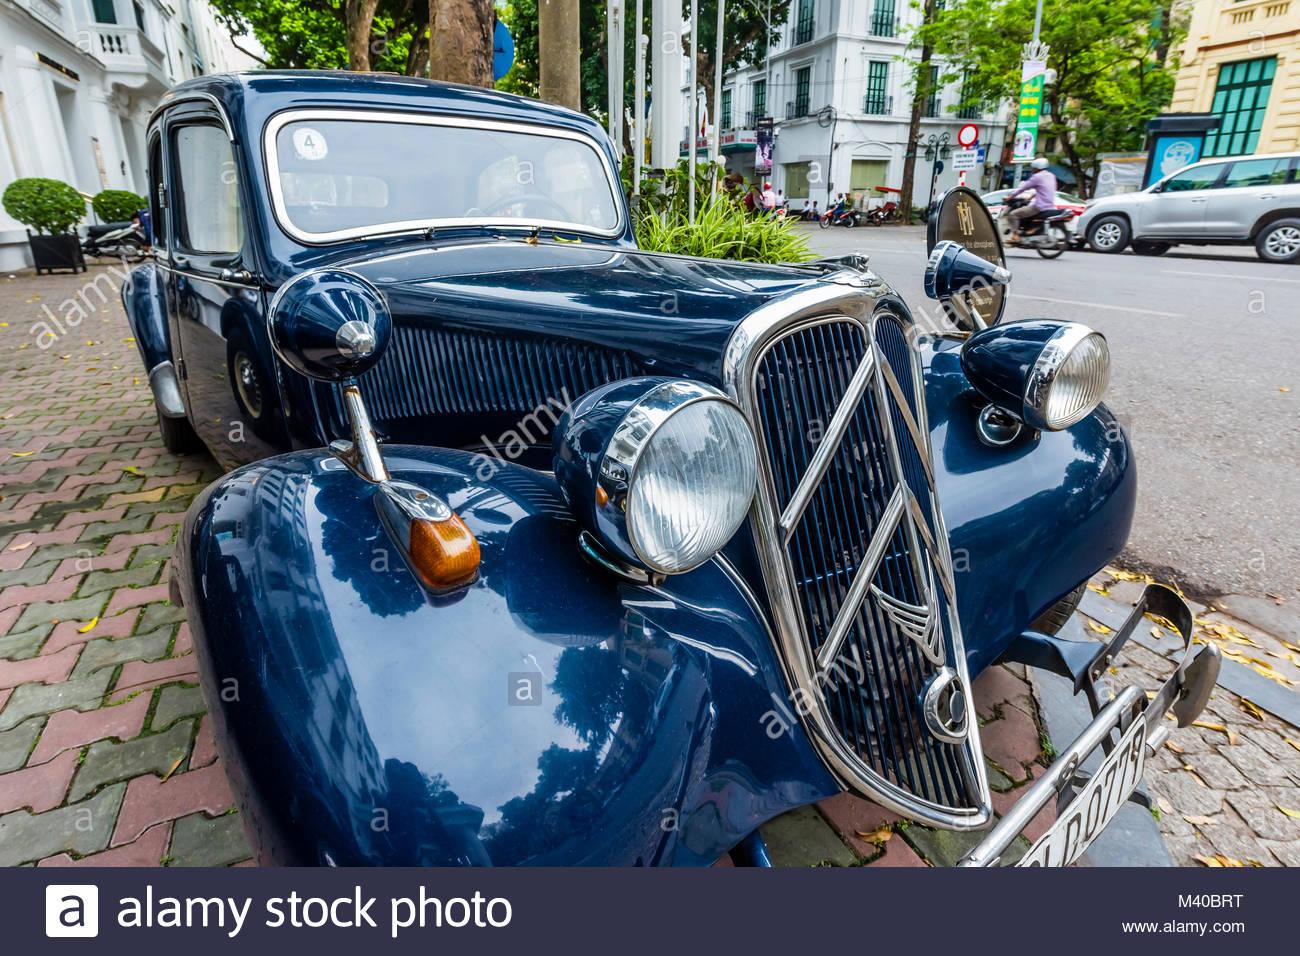 A vintage 1953 Citroen automobile used as a hotel car, Sofitel ...